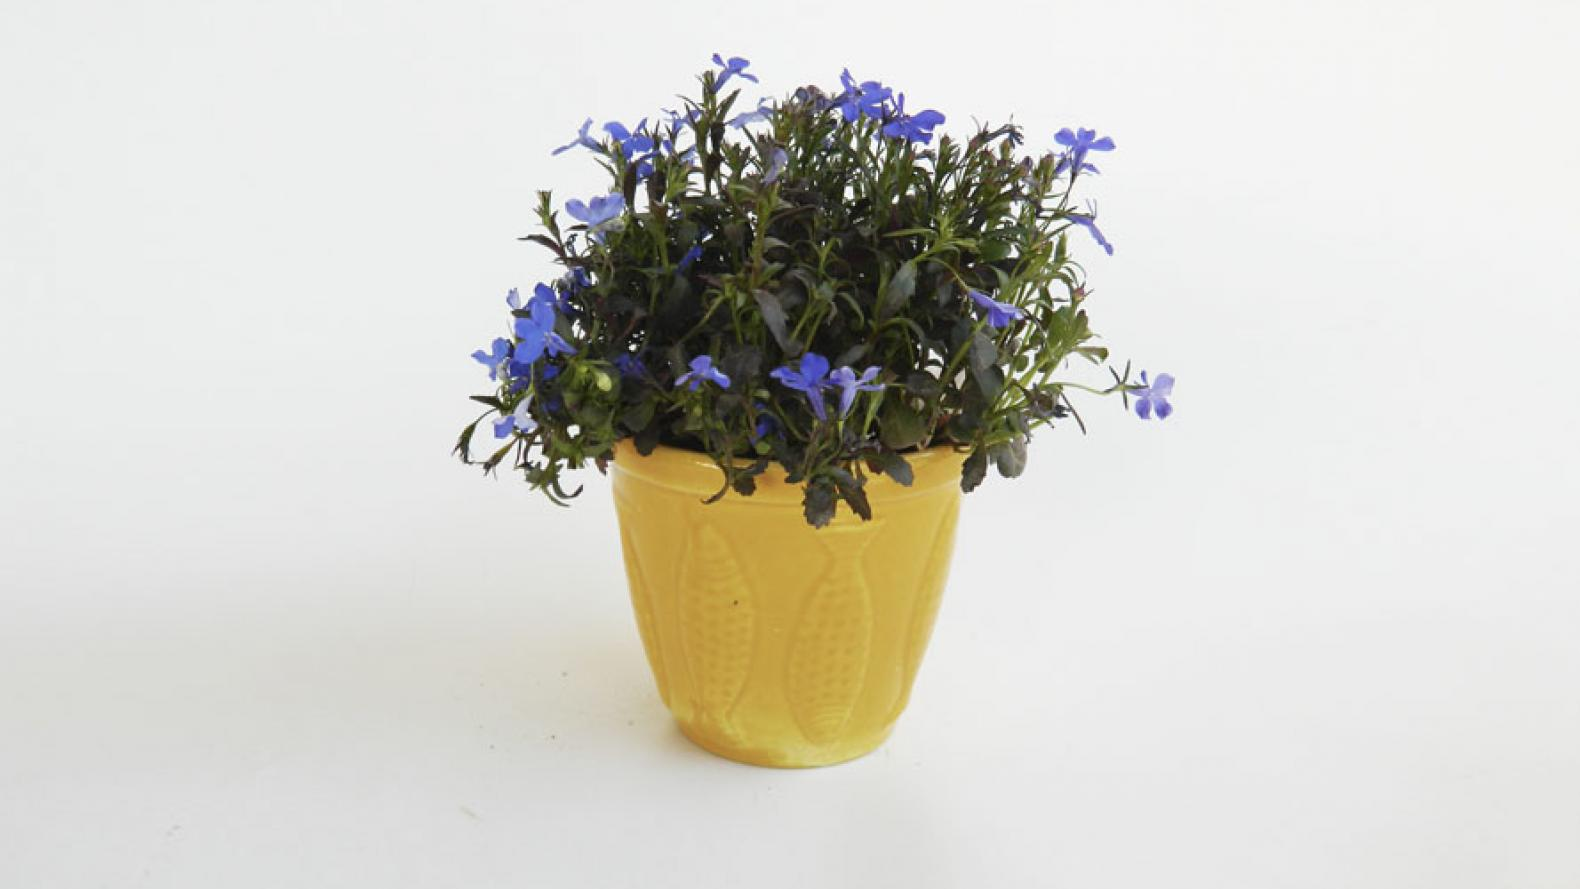 Modo primavera macetas para decorar interiores musa - Macetas para interiores ...